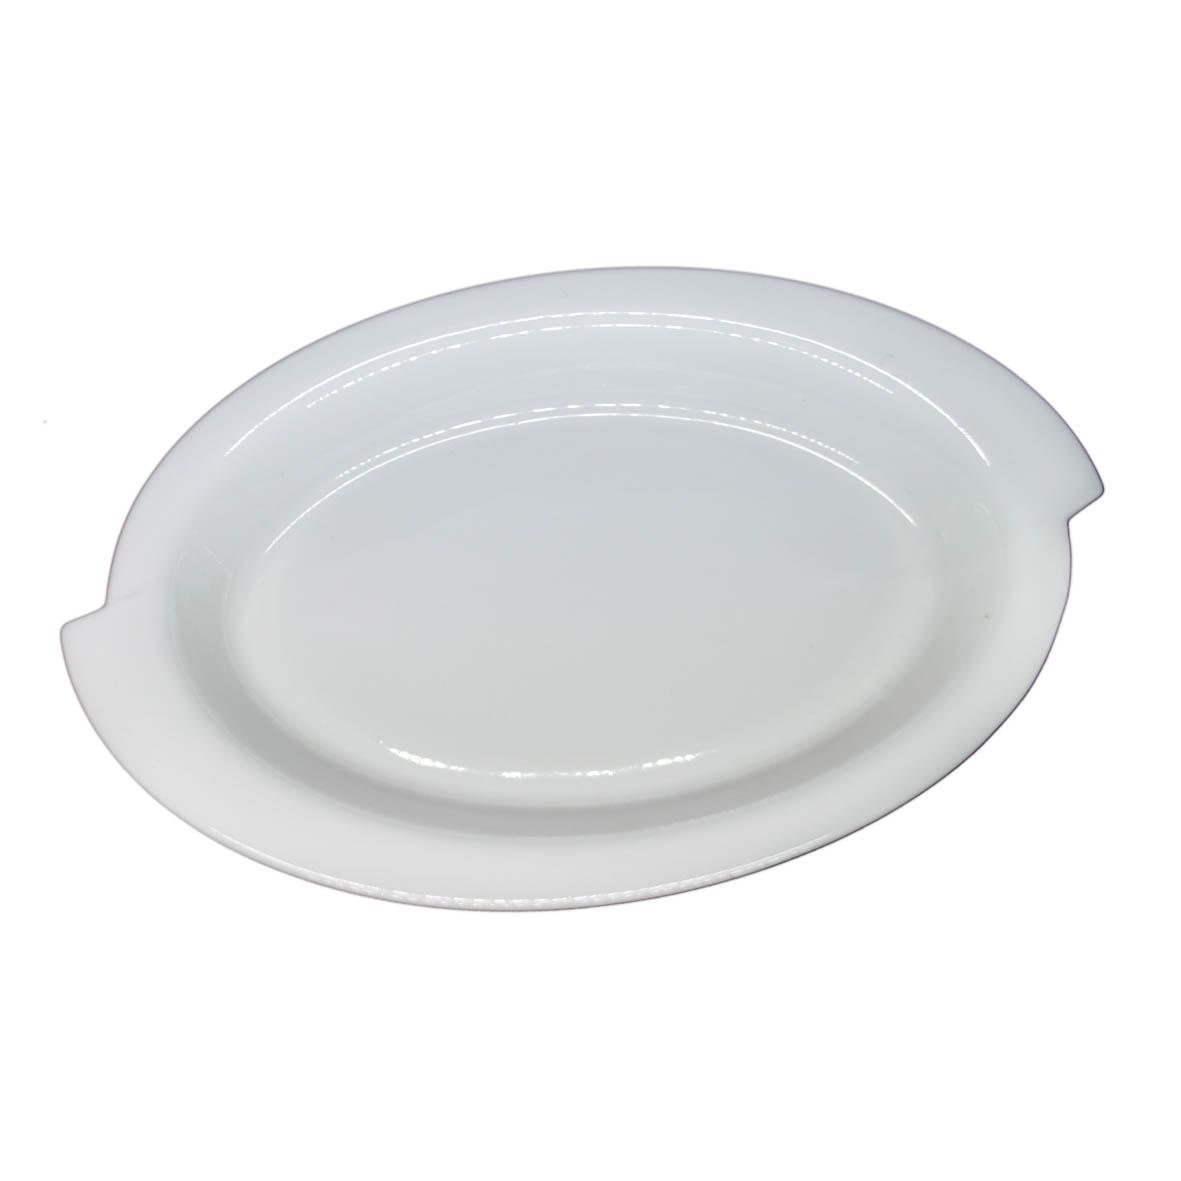 Travessa de Porcelana Oval Borda S 45x29x5